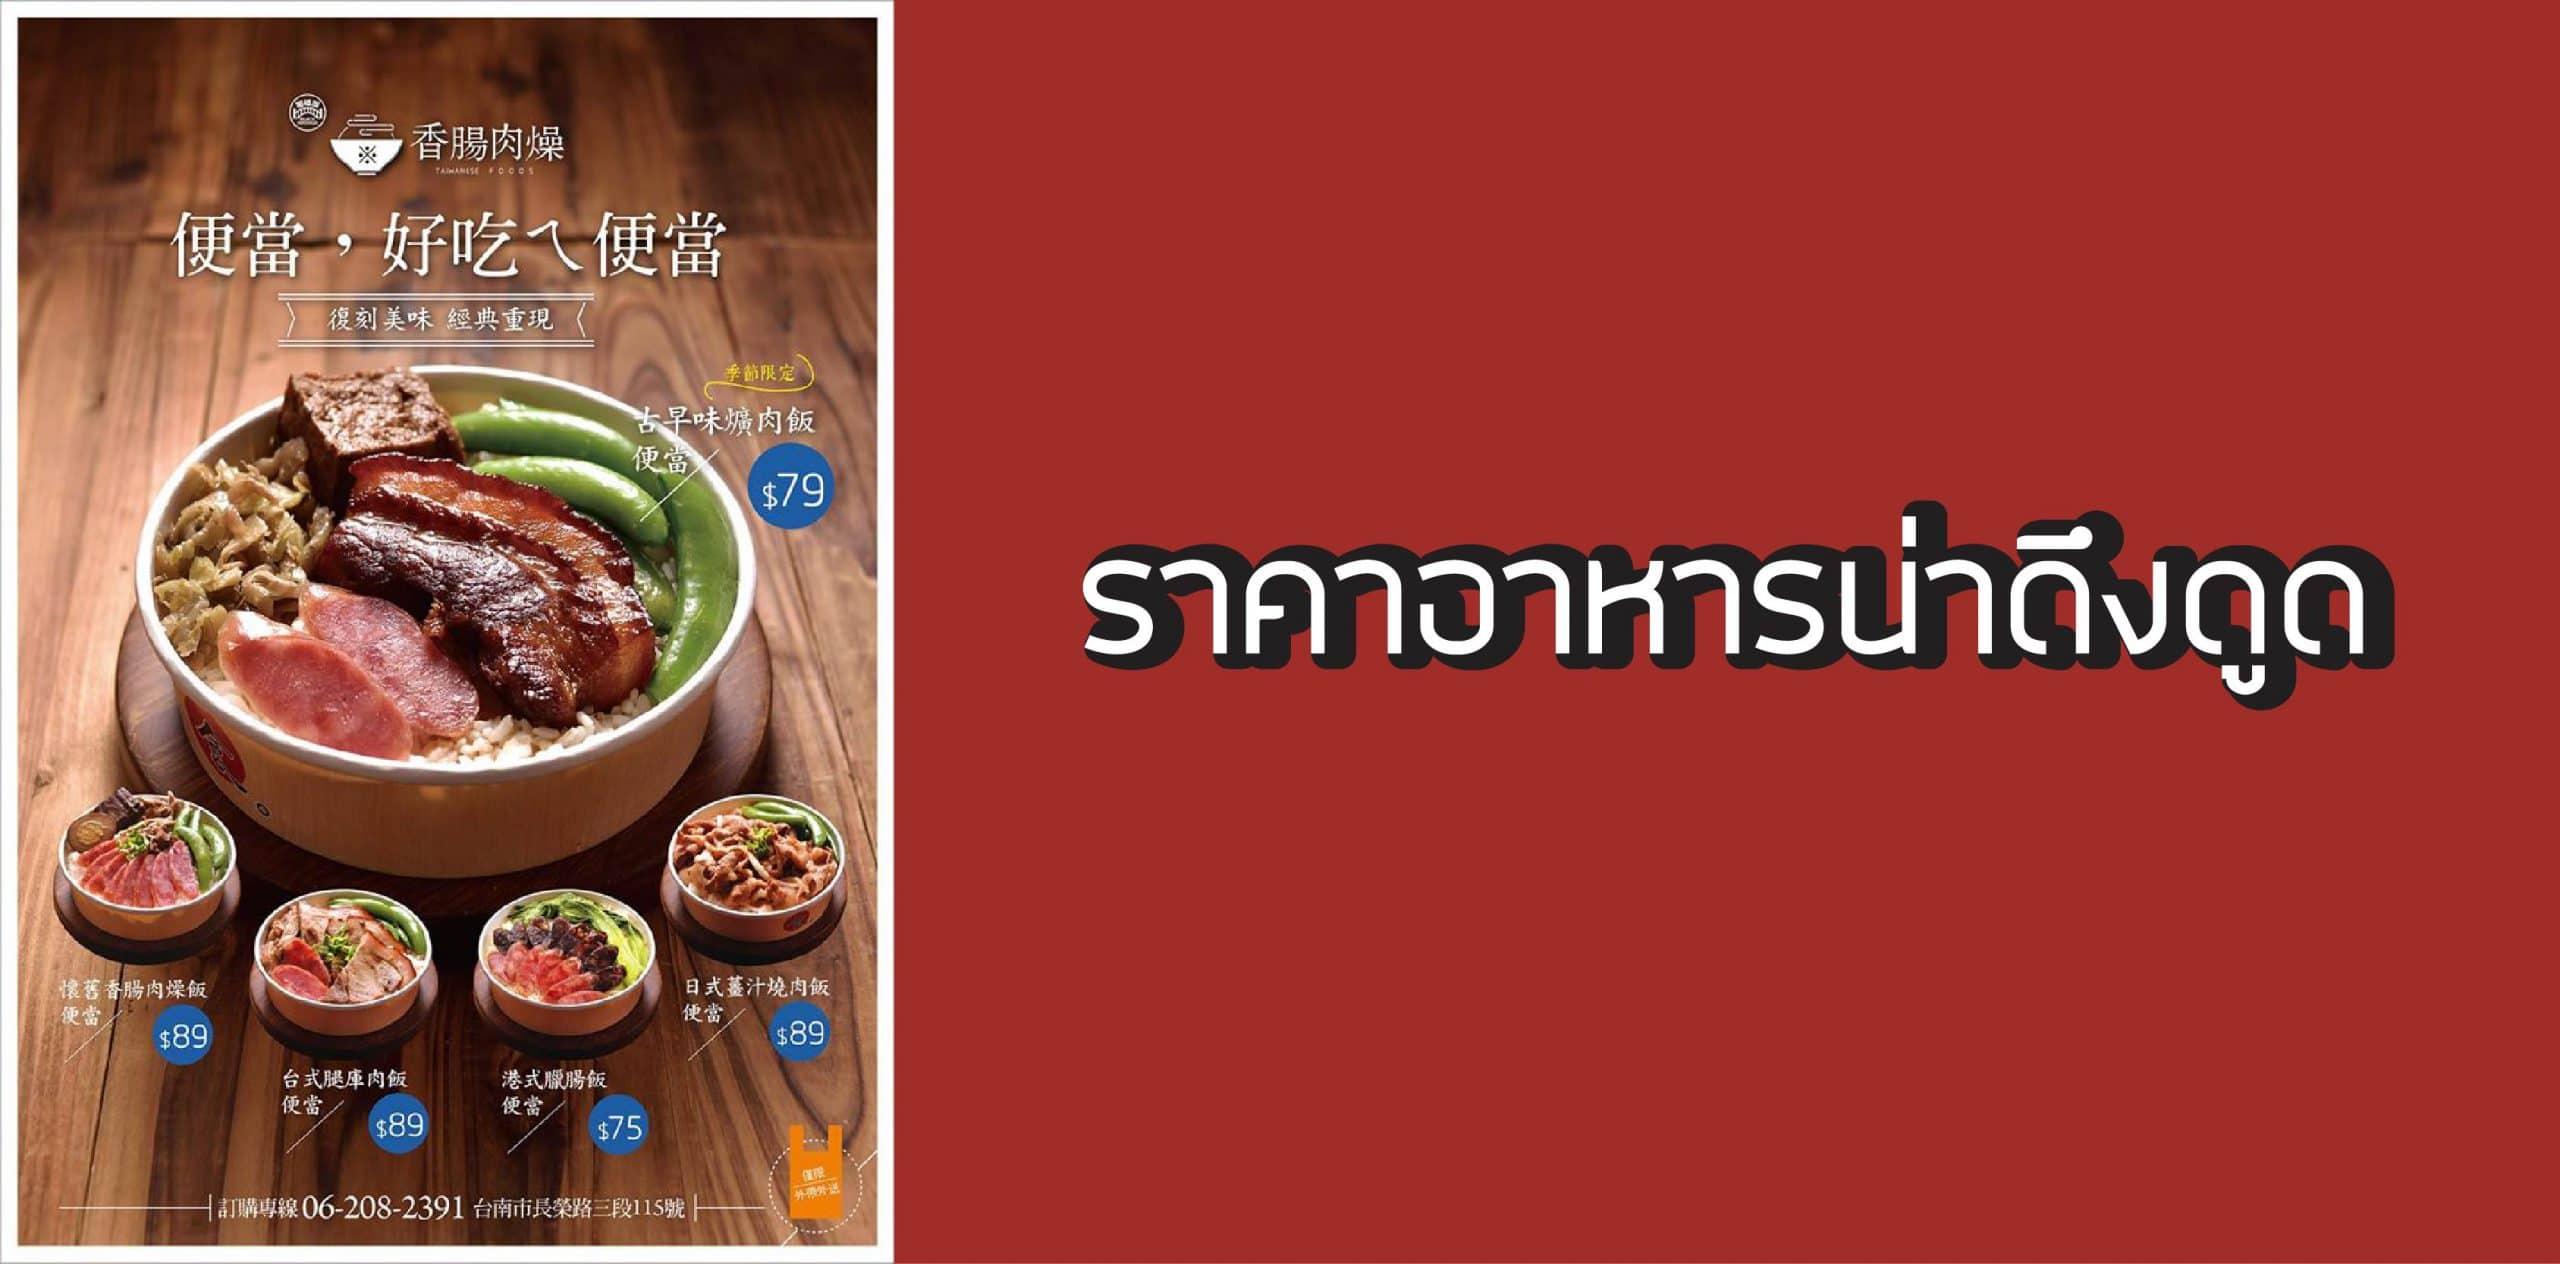 Website menu 02 scaled - เทคนิคการออกแบบเมนูอาหารให้ดูโดดเด่น